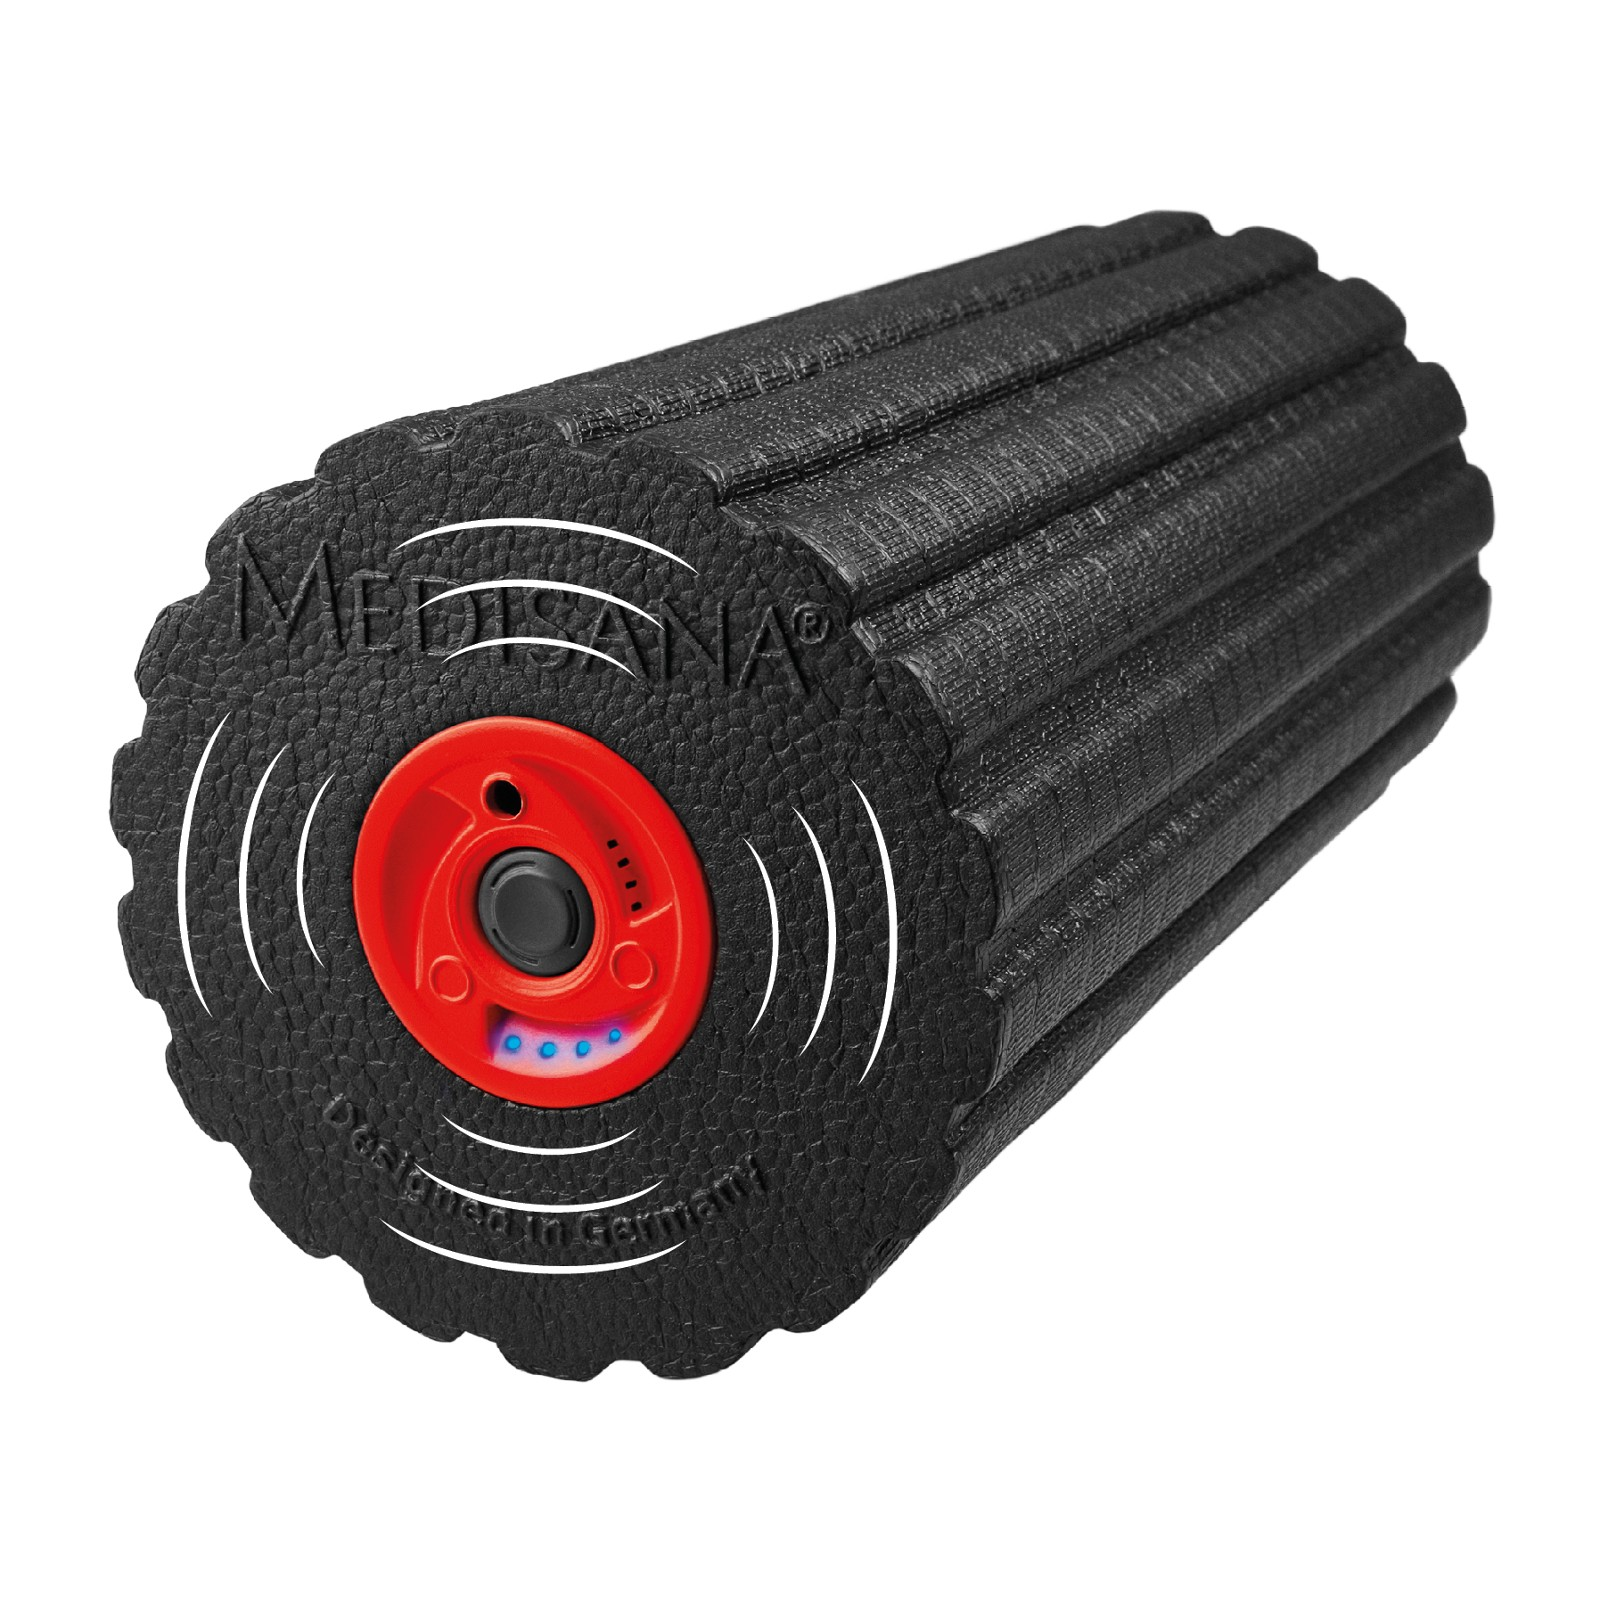 mà belhaus roller standorte medisana faszienrolle powerroll g nstig kaufen sport tiedje